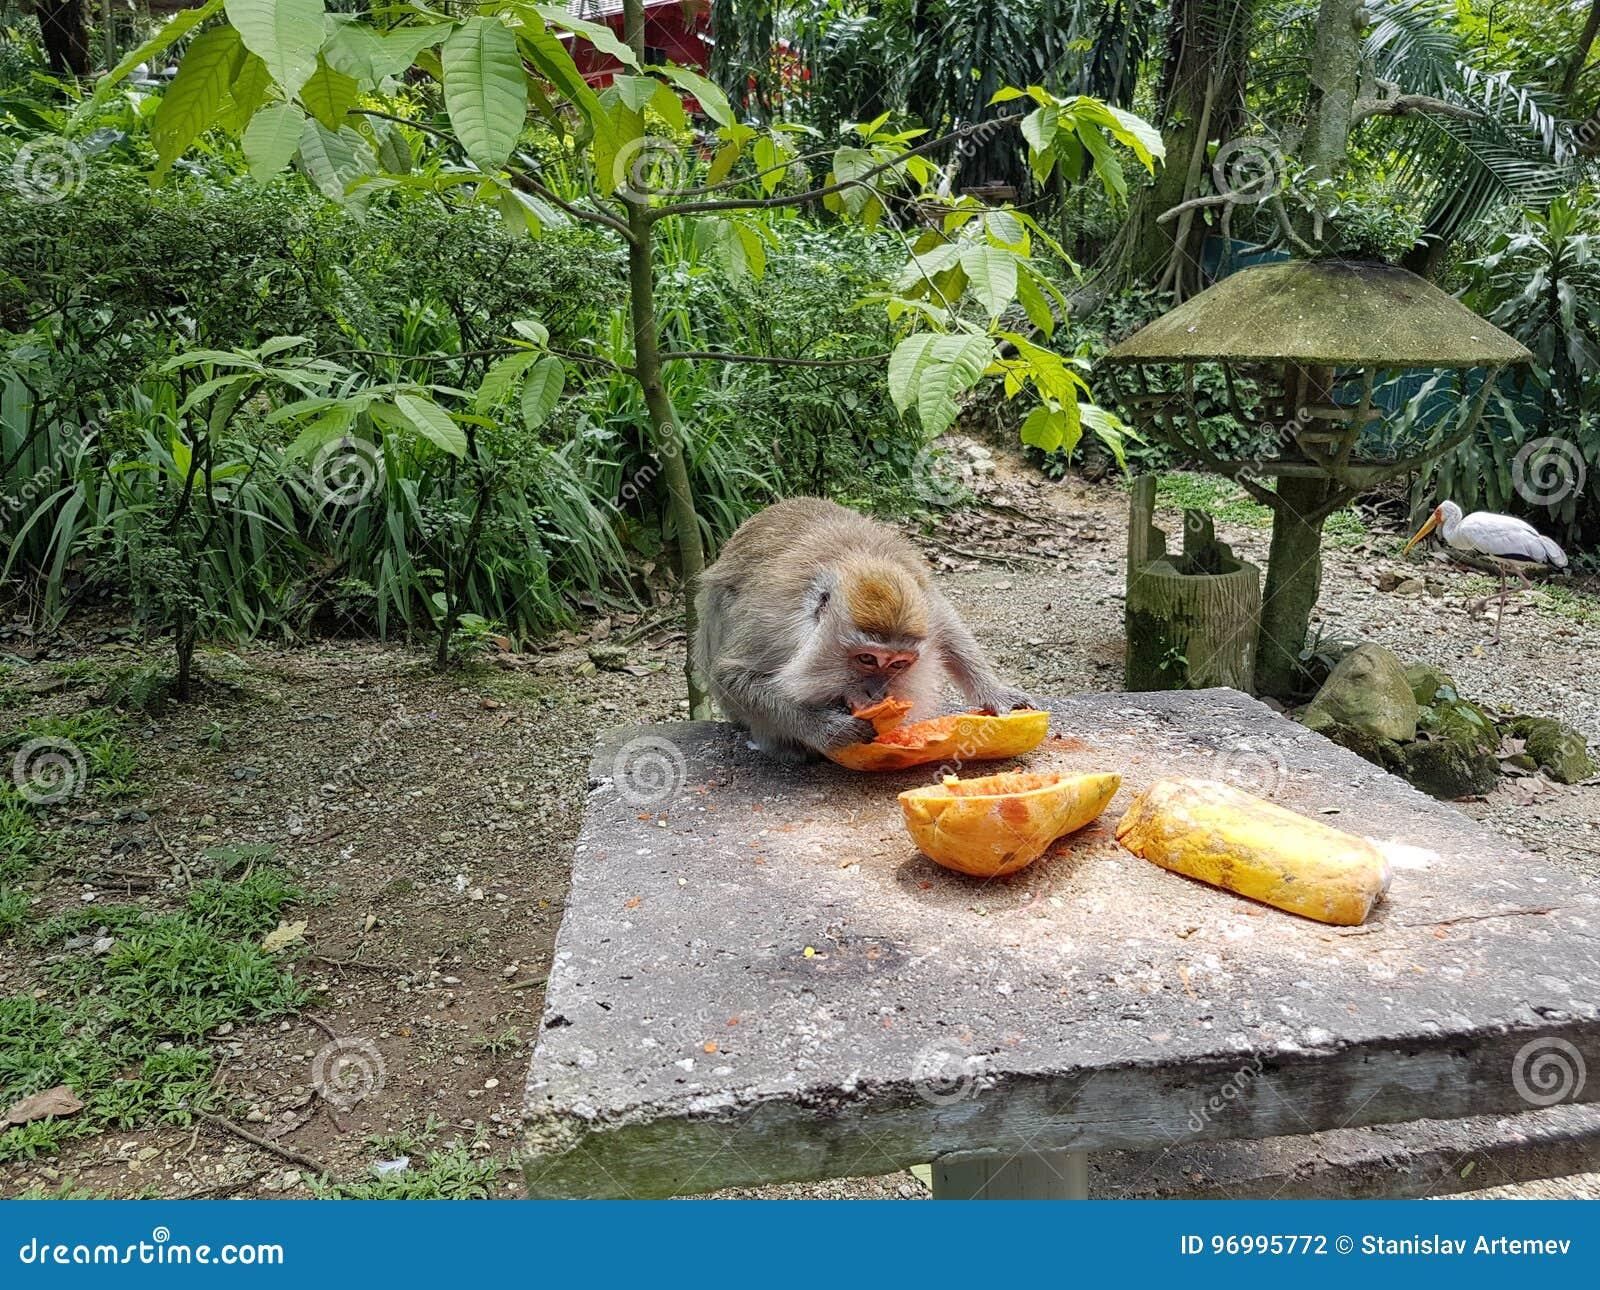 Le singe mange